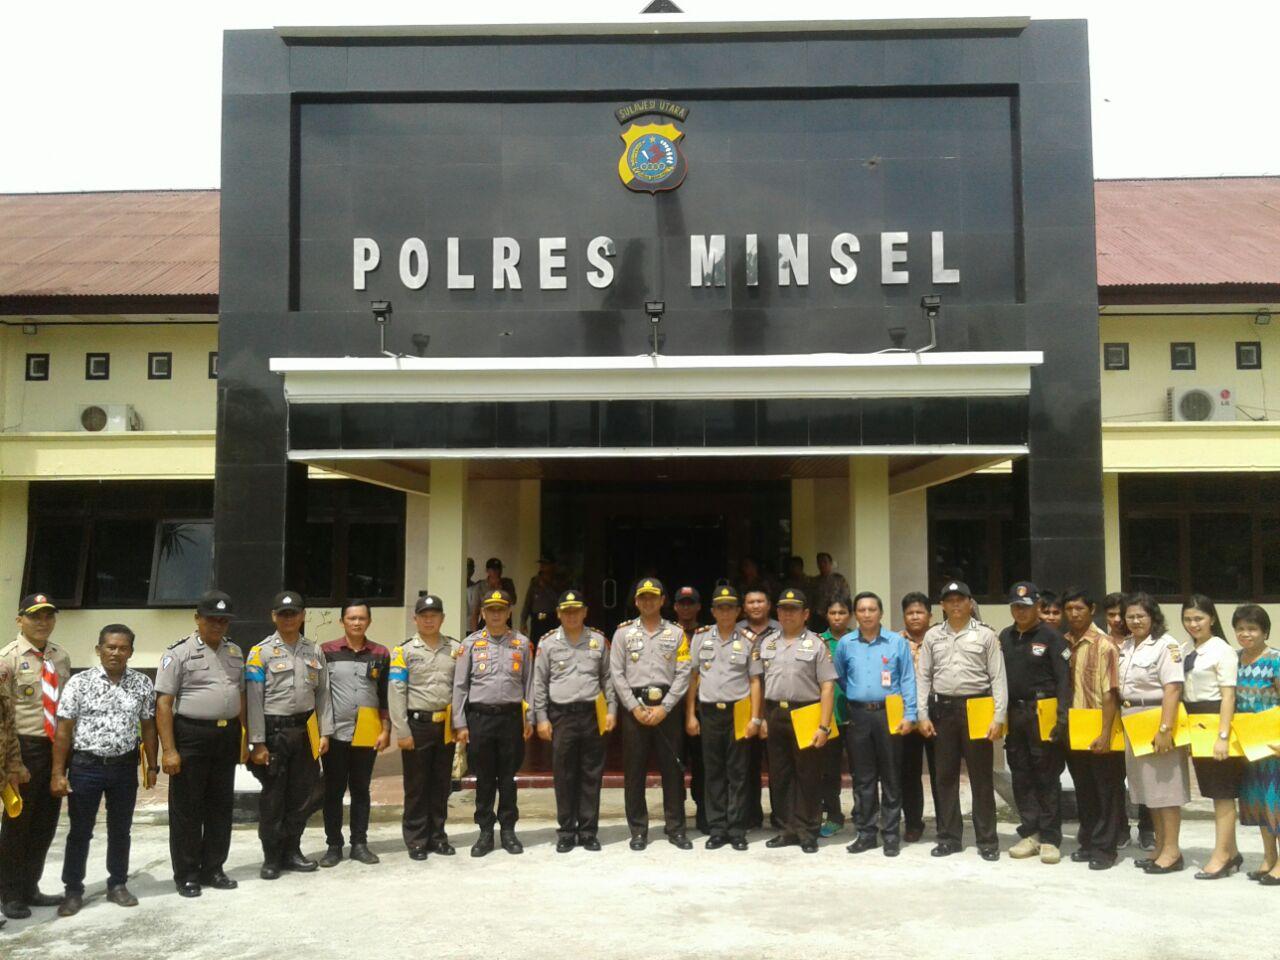 Foto bersama Kapolres Minahasa Selatan AKBP Arya Perdana, SH,SIK,MSi, setelah memberikan penghargaan kepada puluhan personil jajaran, insan pers, pegawai honorer, tokoh masyarakat hingga petugas kebersihan (officeboy)